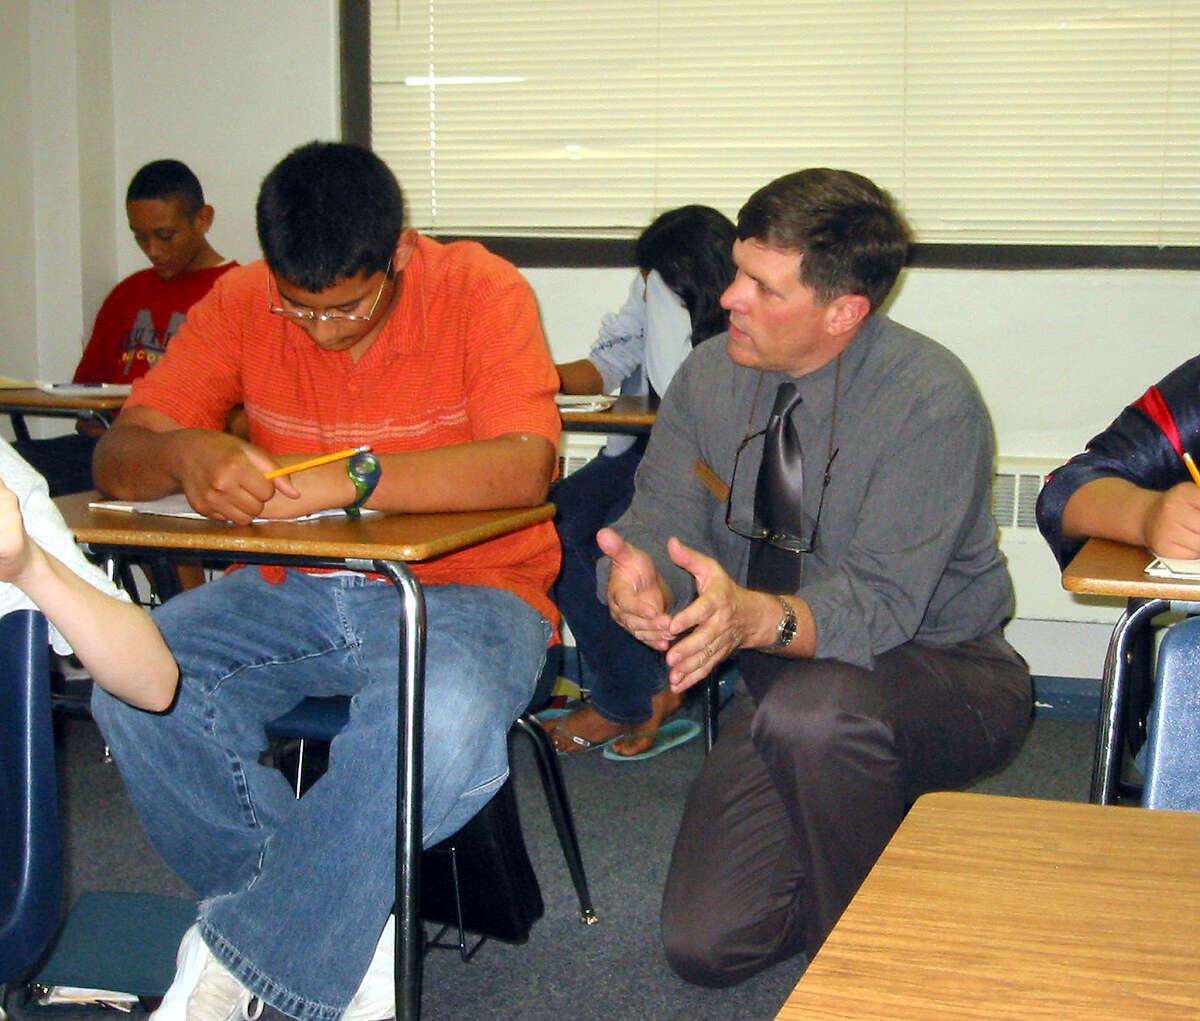 29. New Braunfels Middle School:New Braunfels ISD 971 students, student-teacher ratio 16:1 Overall: A-Academics: A-Teachers: A-Diversity: B+